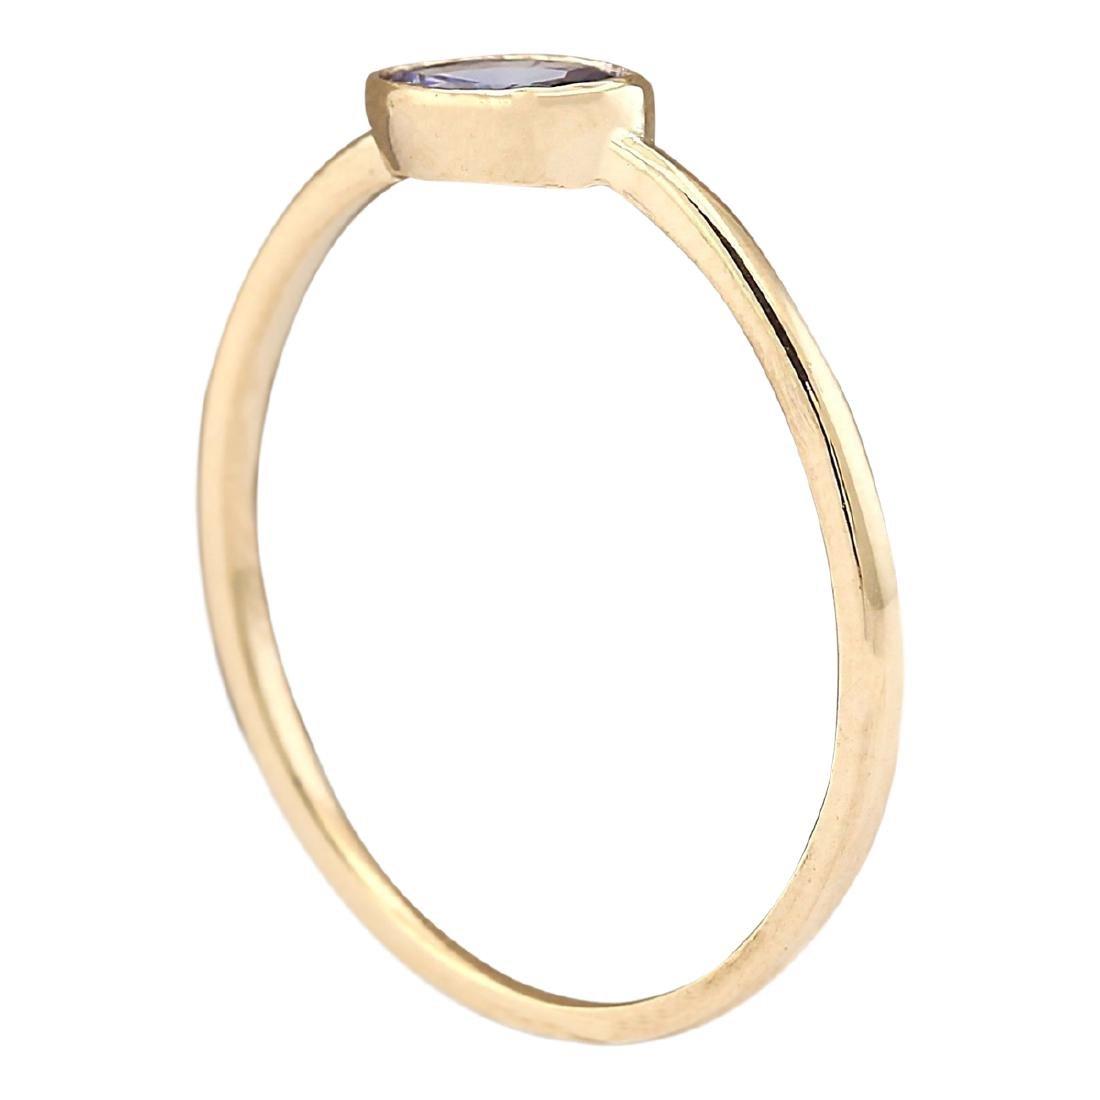 0.60 CTW Natural Blue Tanzanite Ring 18K Solid Yellow - 3